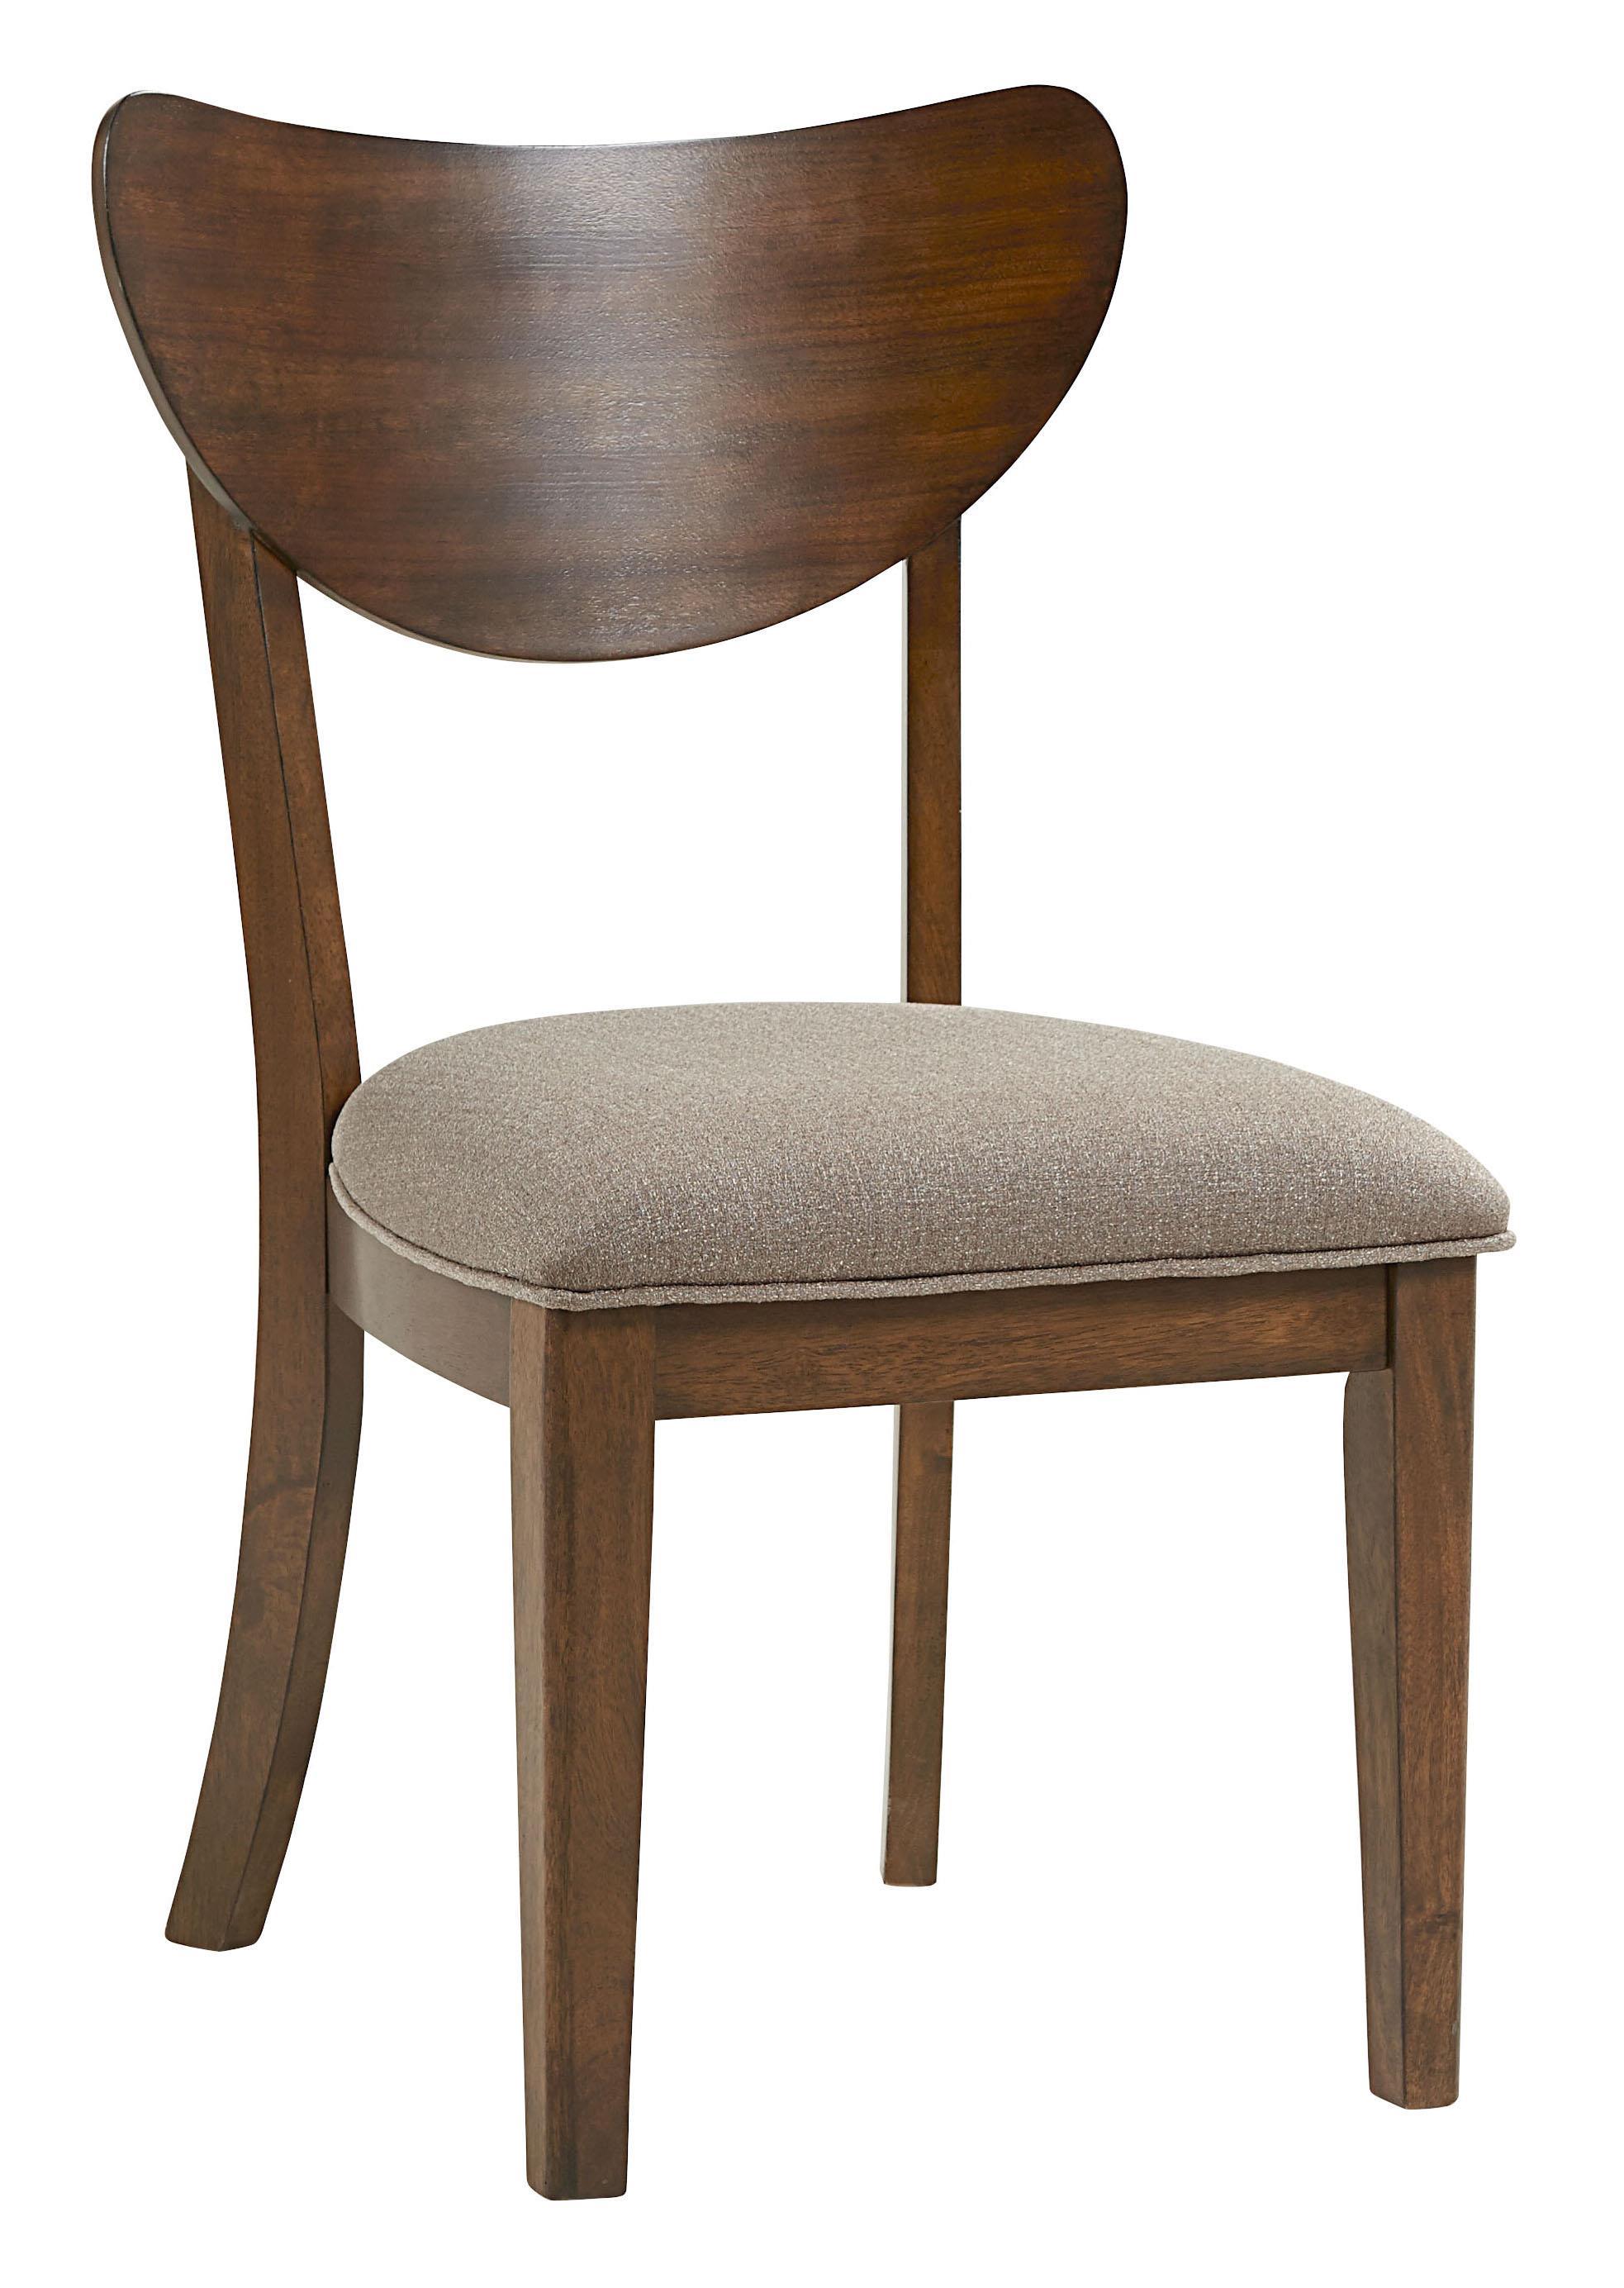 Standard Furniture Roxbury Side Chair - Item Number: 16204